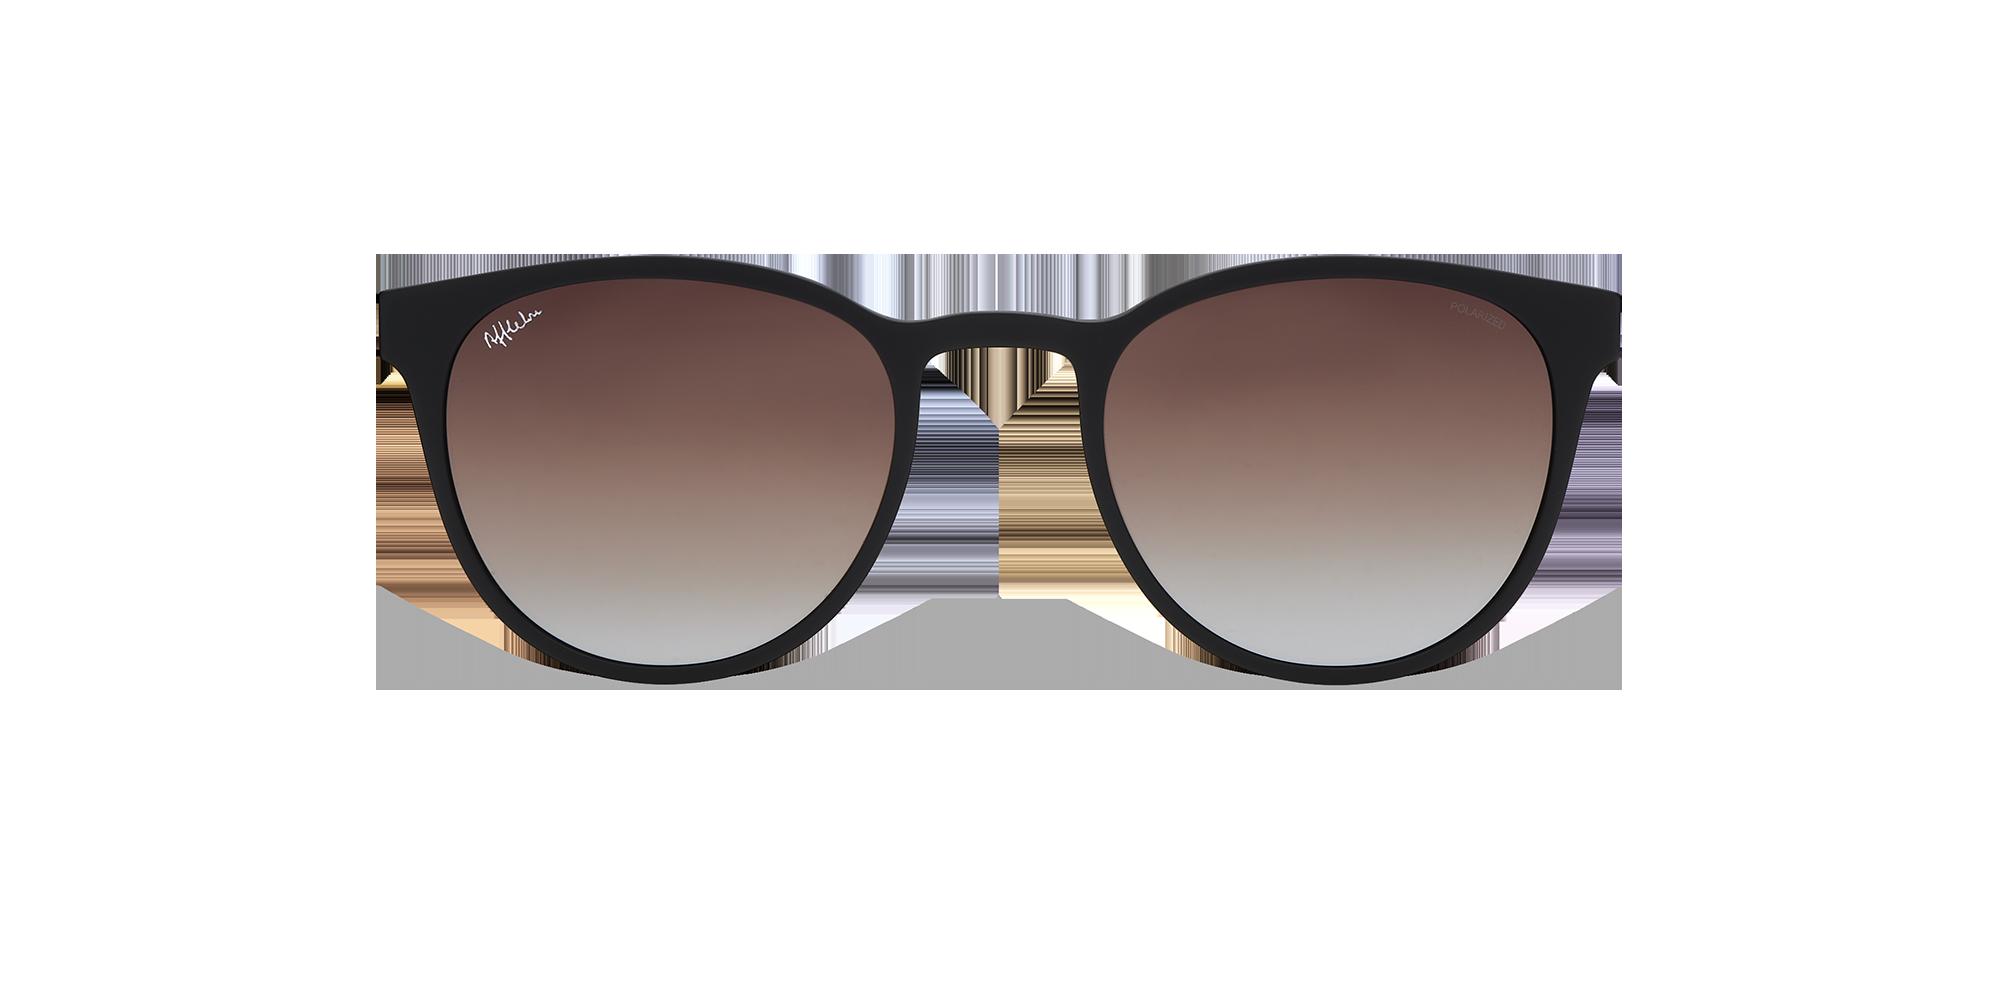 afflelou/france/products/smart_clip/clips_glasses/TMK44POBK014920.png